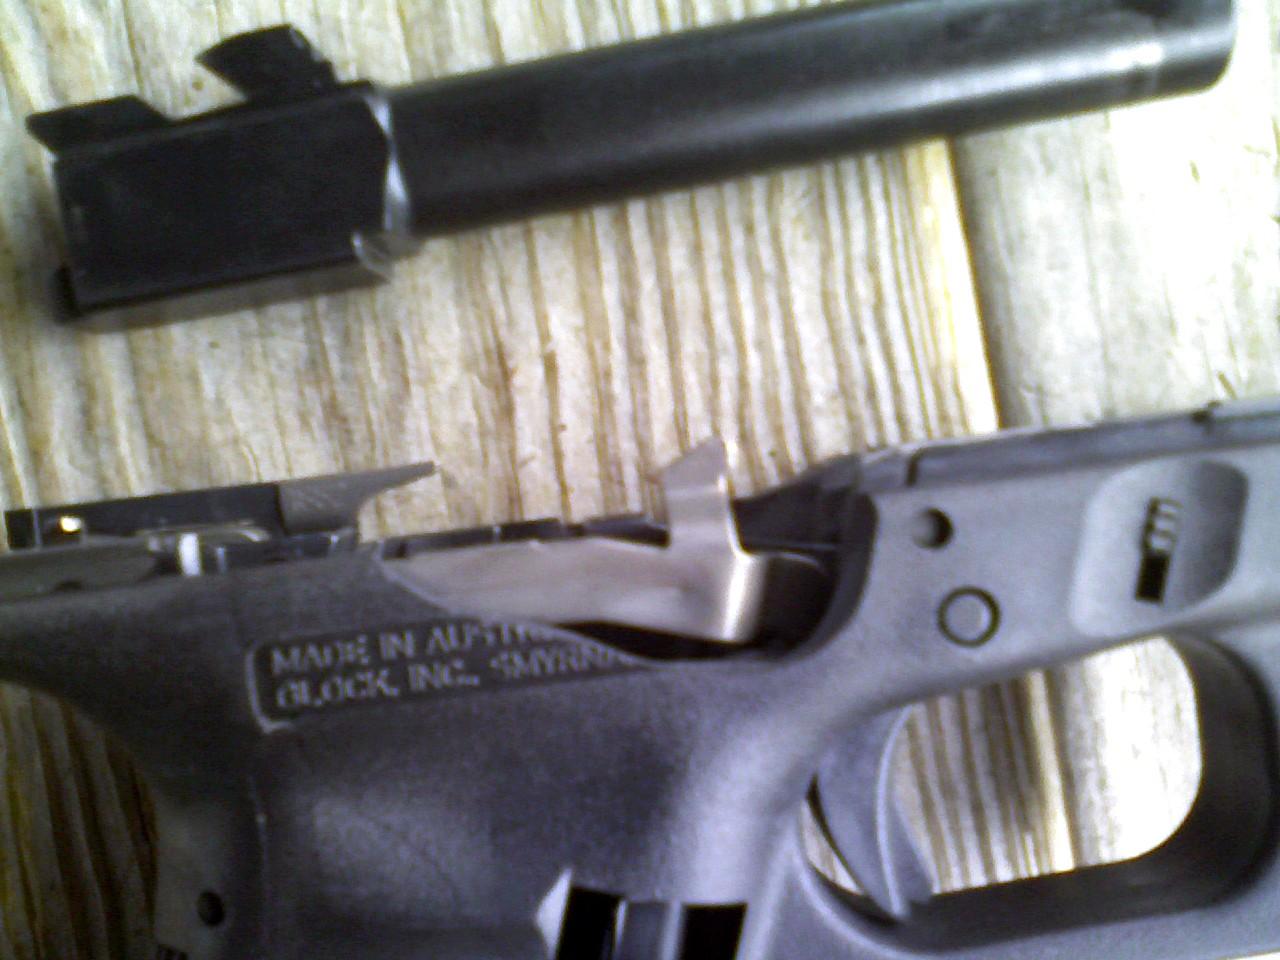 Glock 22 Kb at the range today-pic-0018.jpg